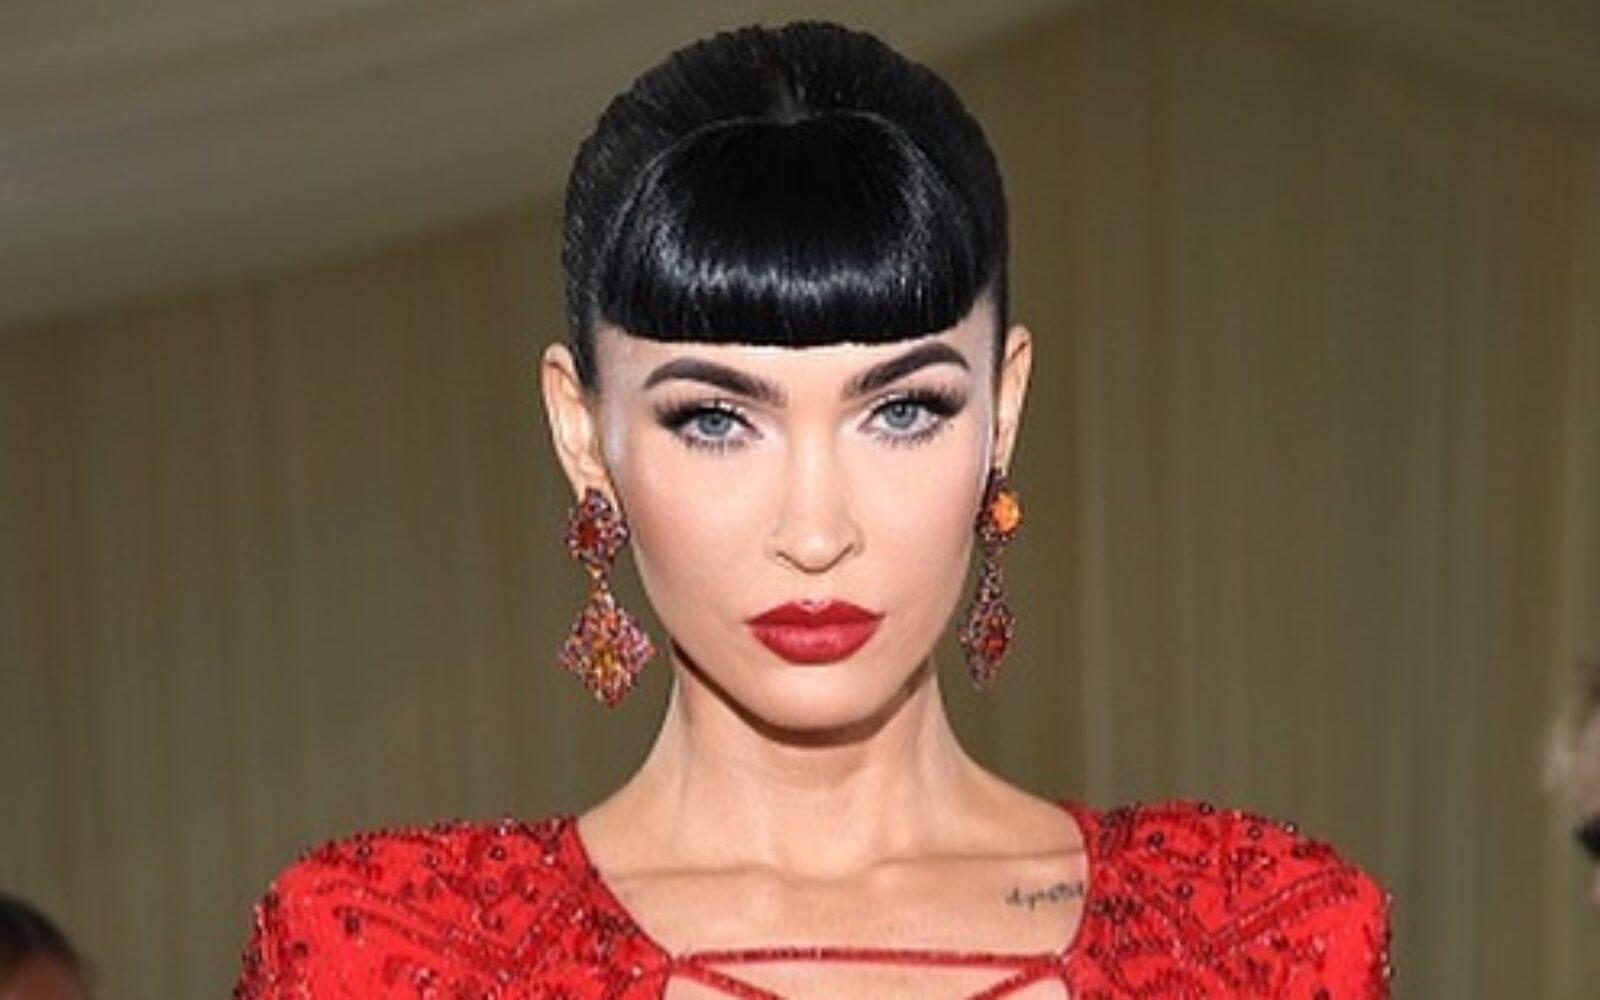 Megan Fox at the 2021 Met Gala; Best of hair and makeup